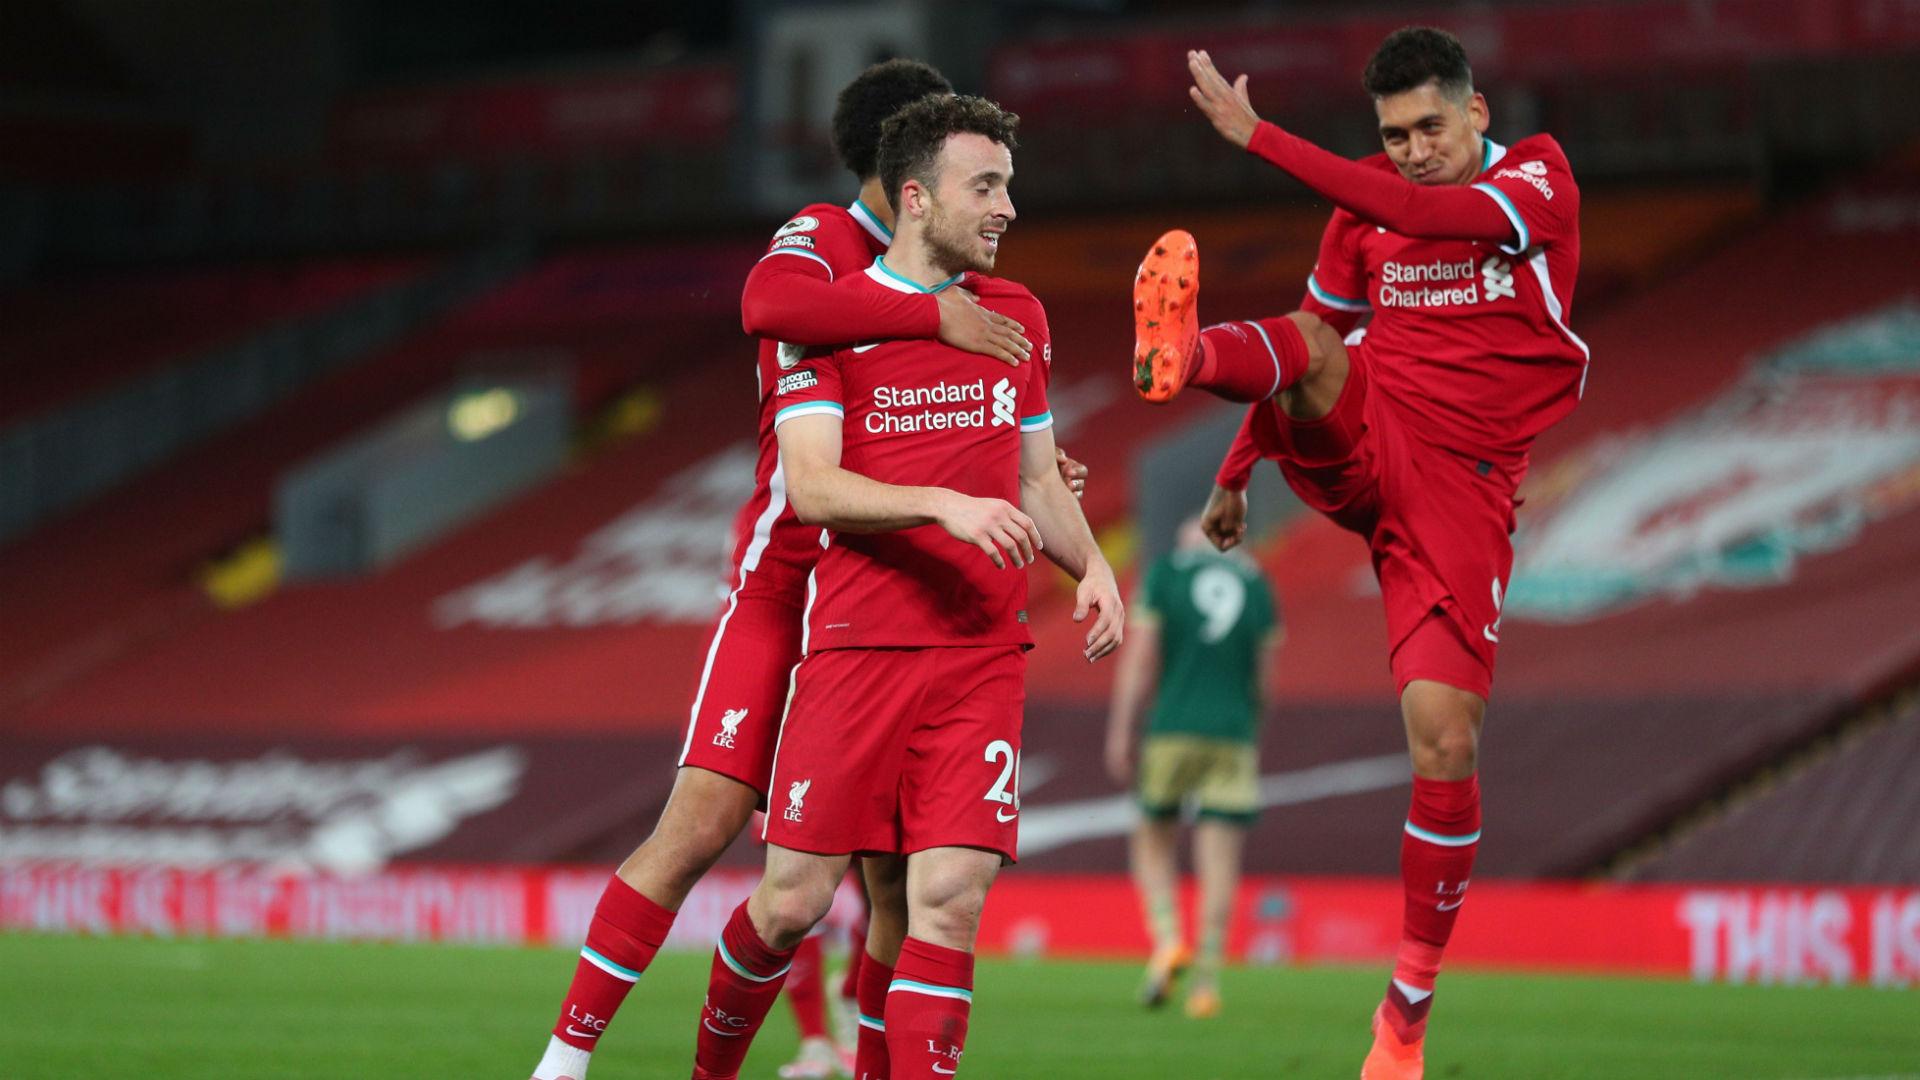 Premier League data dive: Liverpool return to winning ways, Man Utd and Chelsea in uninspiring draw